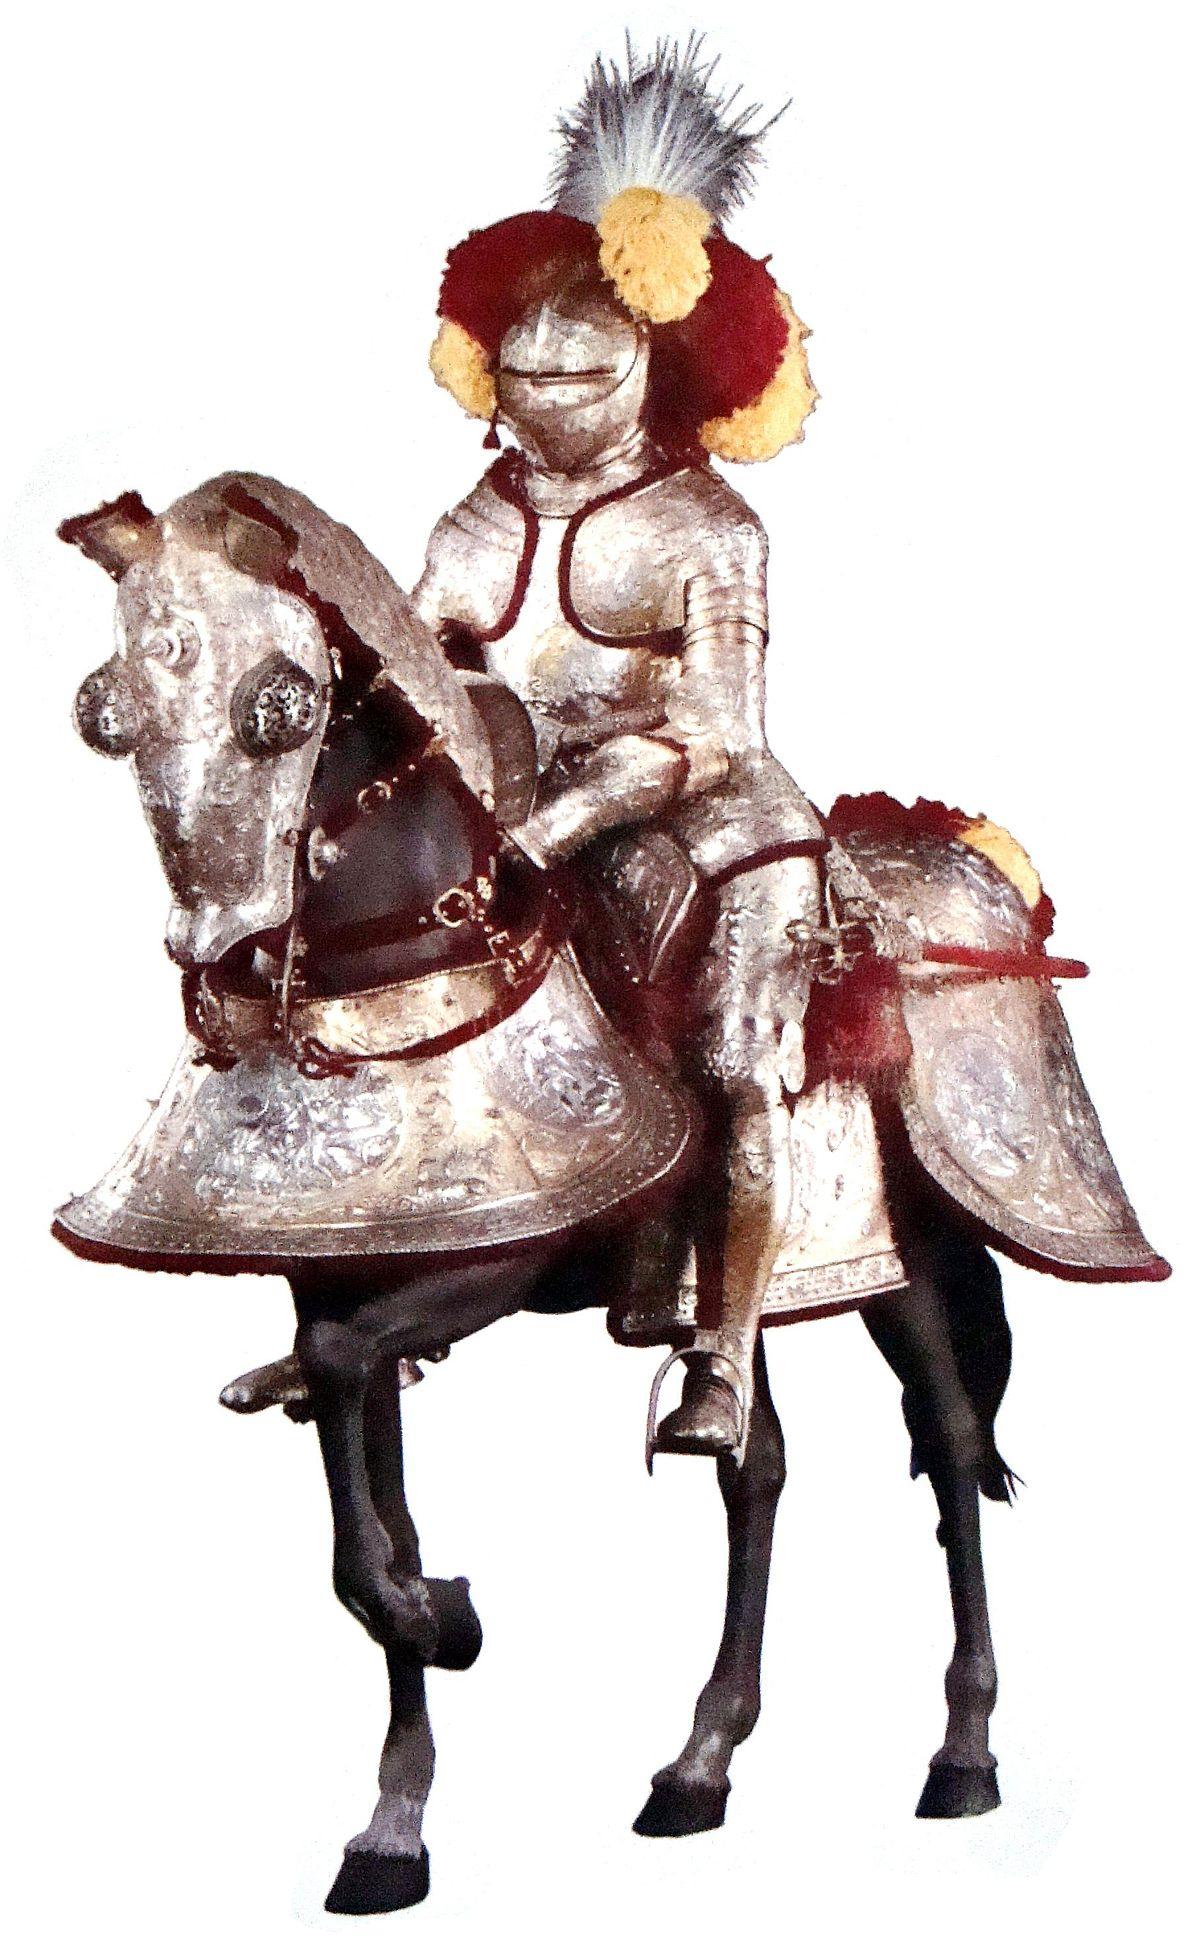 Torneo medieval - Wikipedia, la enciclopedia libre